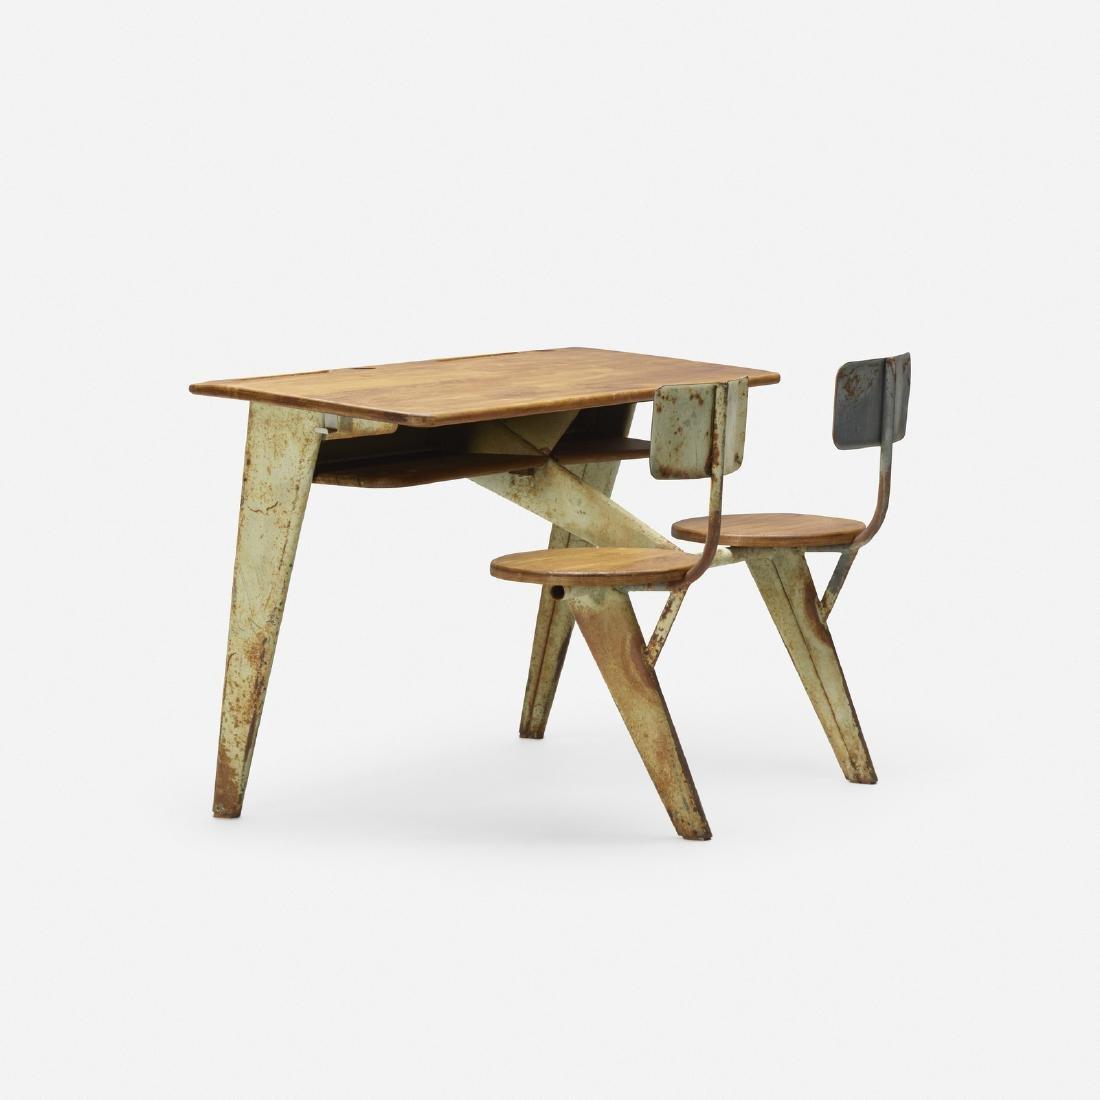 Jean Prouve, school desk